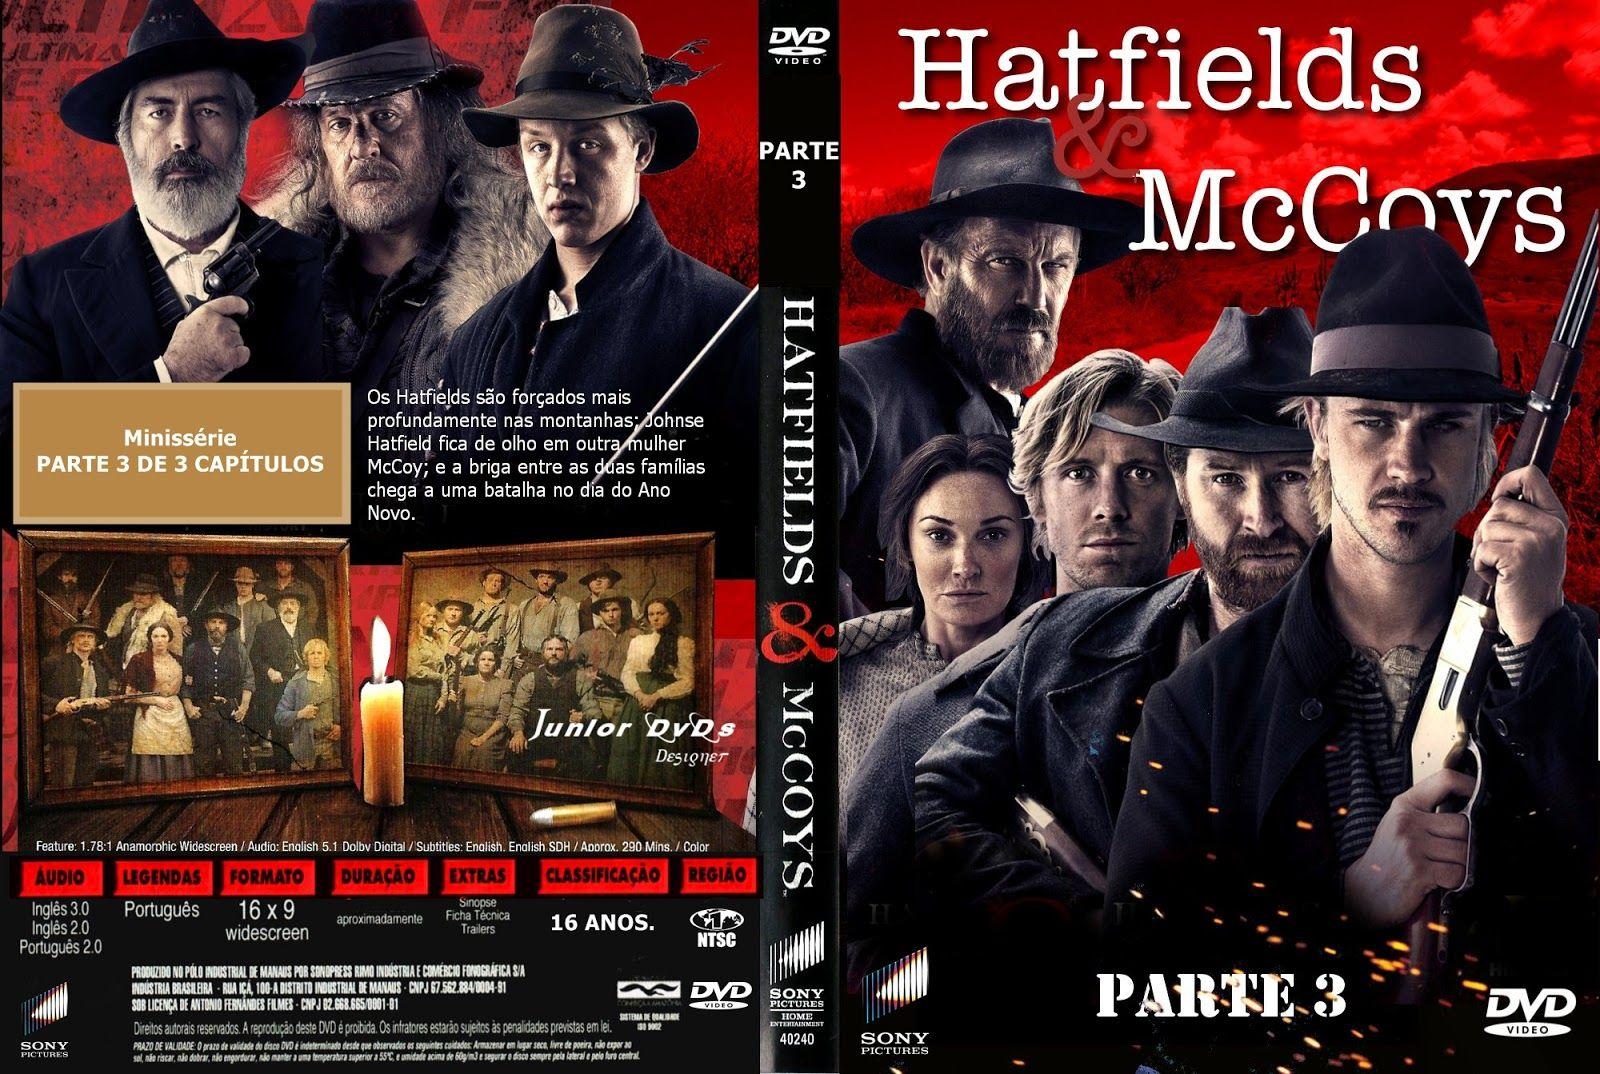 Hatfields Mccoys Ep 3 2012 Filmes De Acao Filmes Dvd